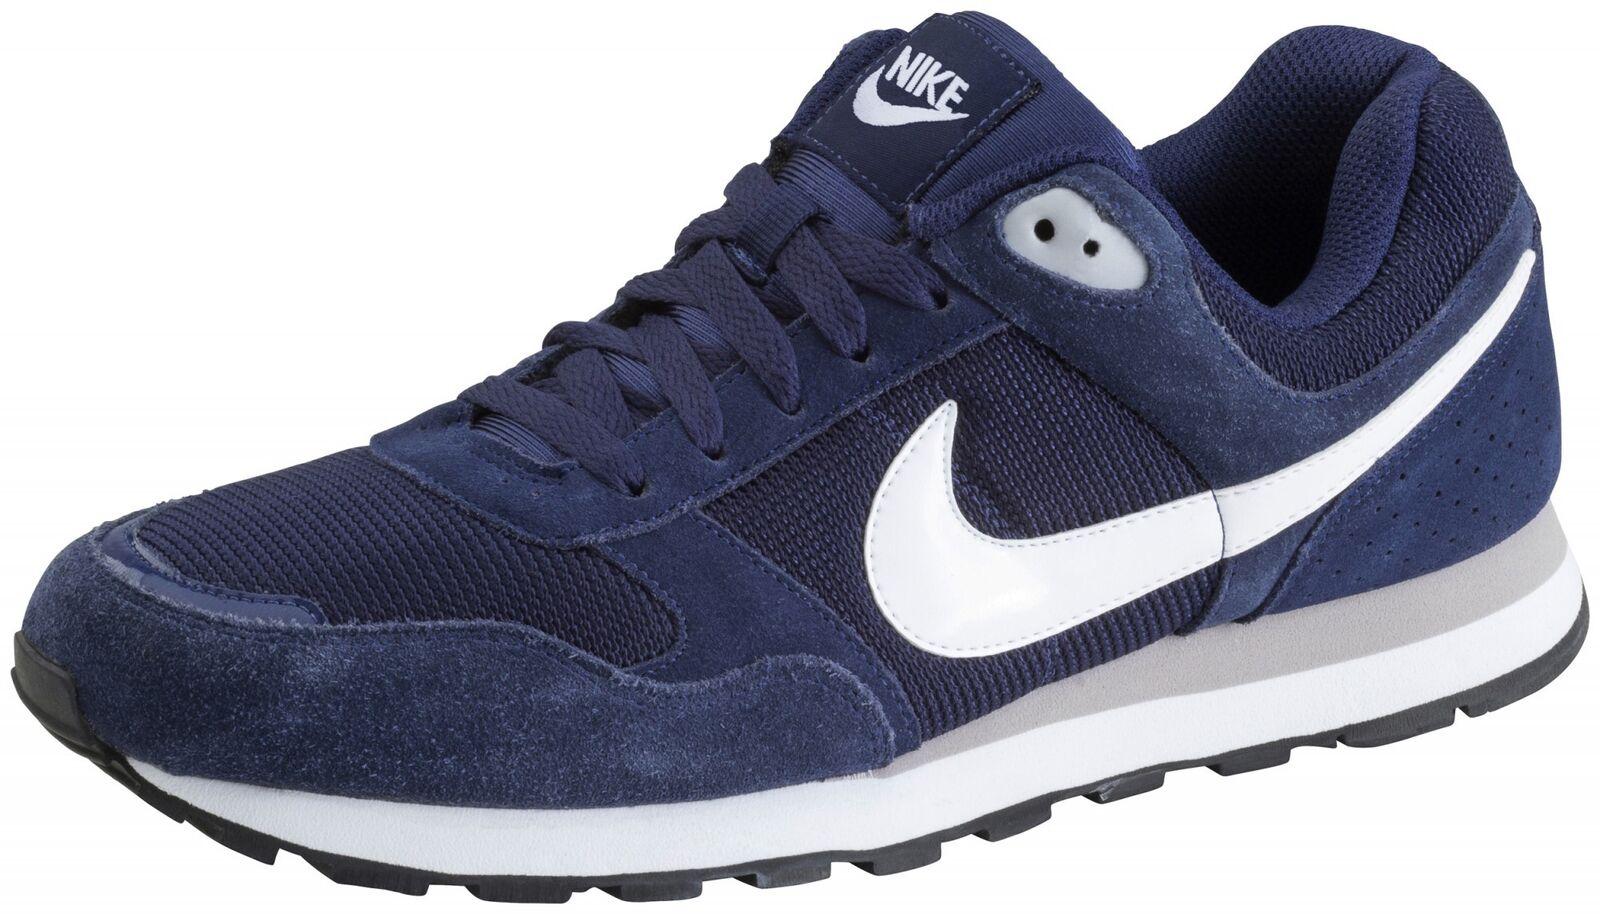 Nike Sneakers  MD RUNNER 2 HERREN  Sportschuhe Freizeitschuhe Sportschuhe